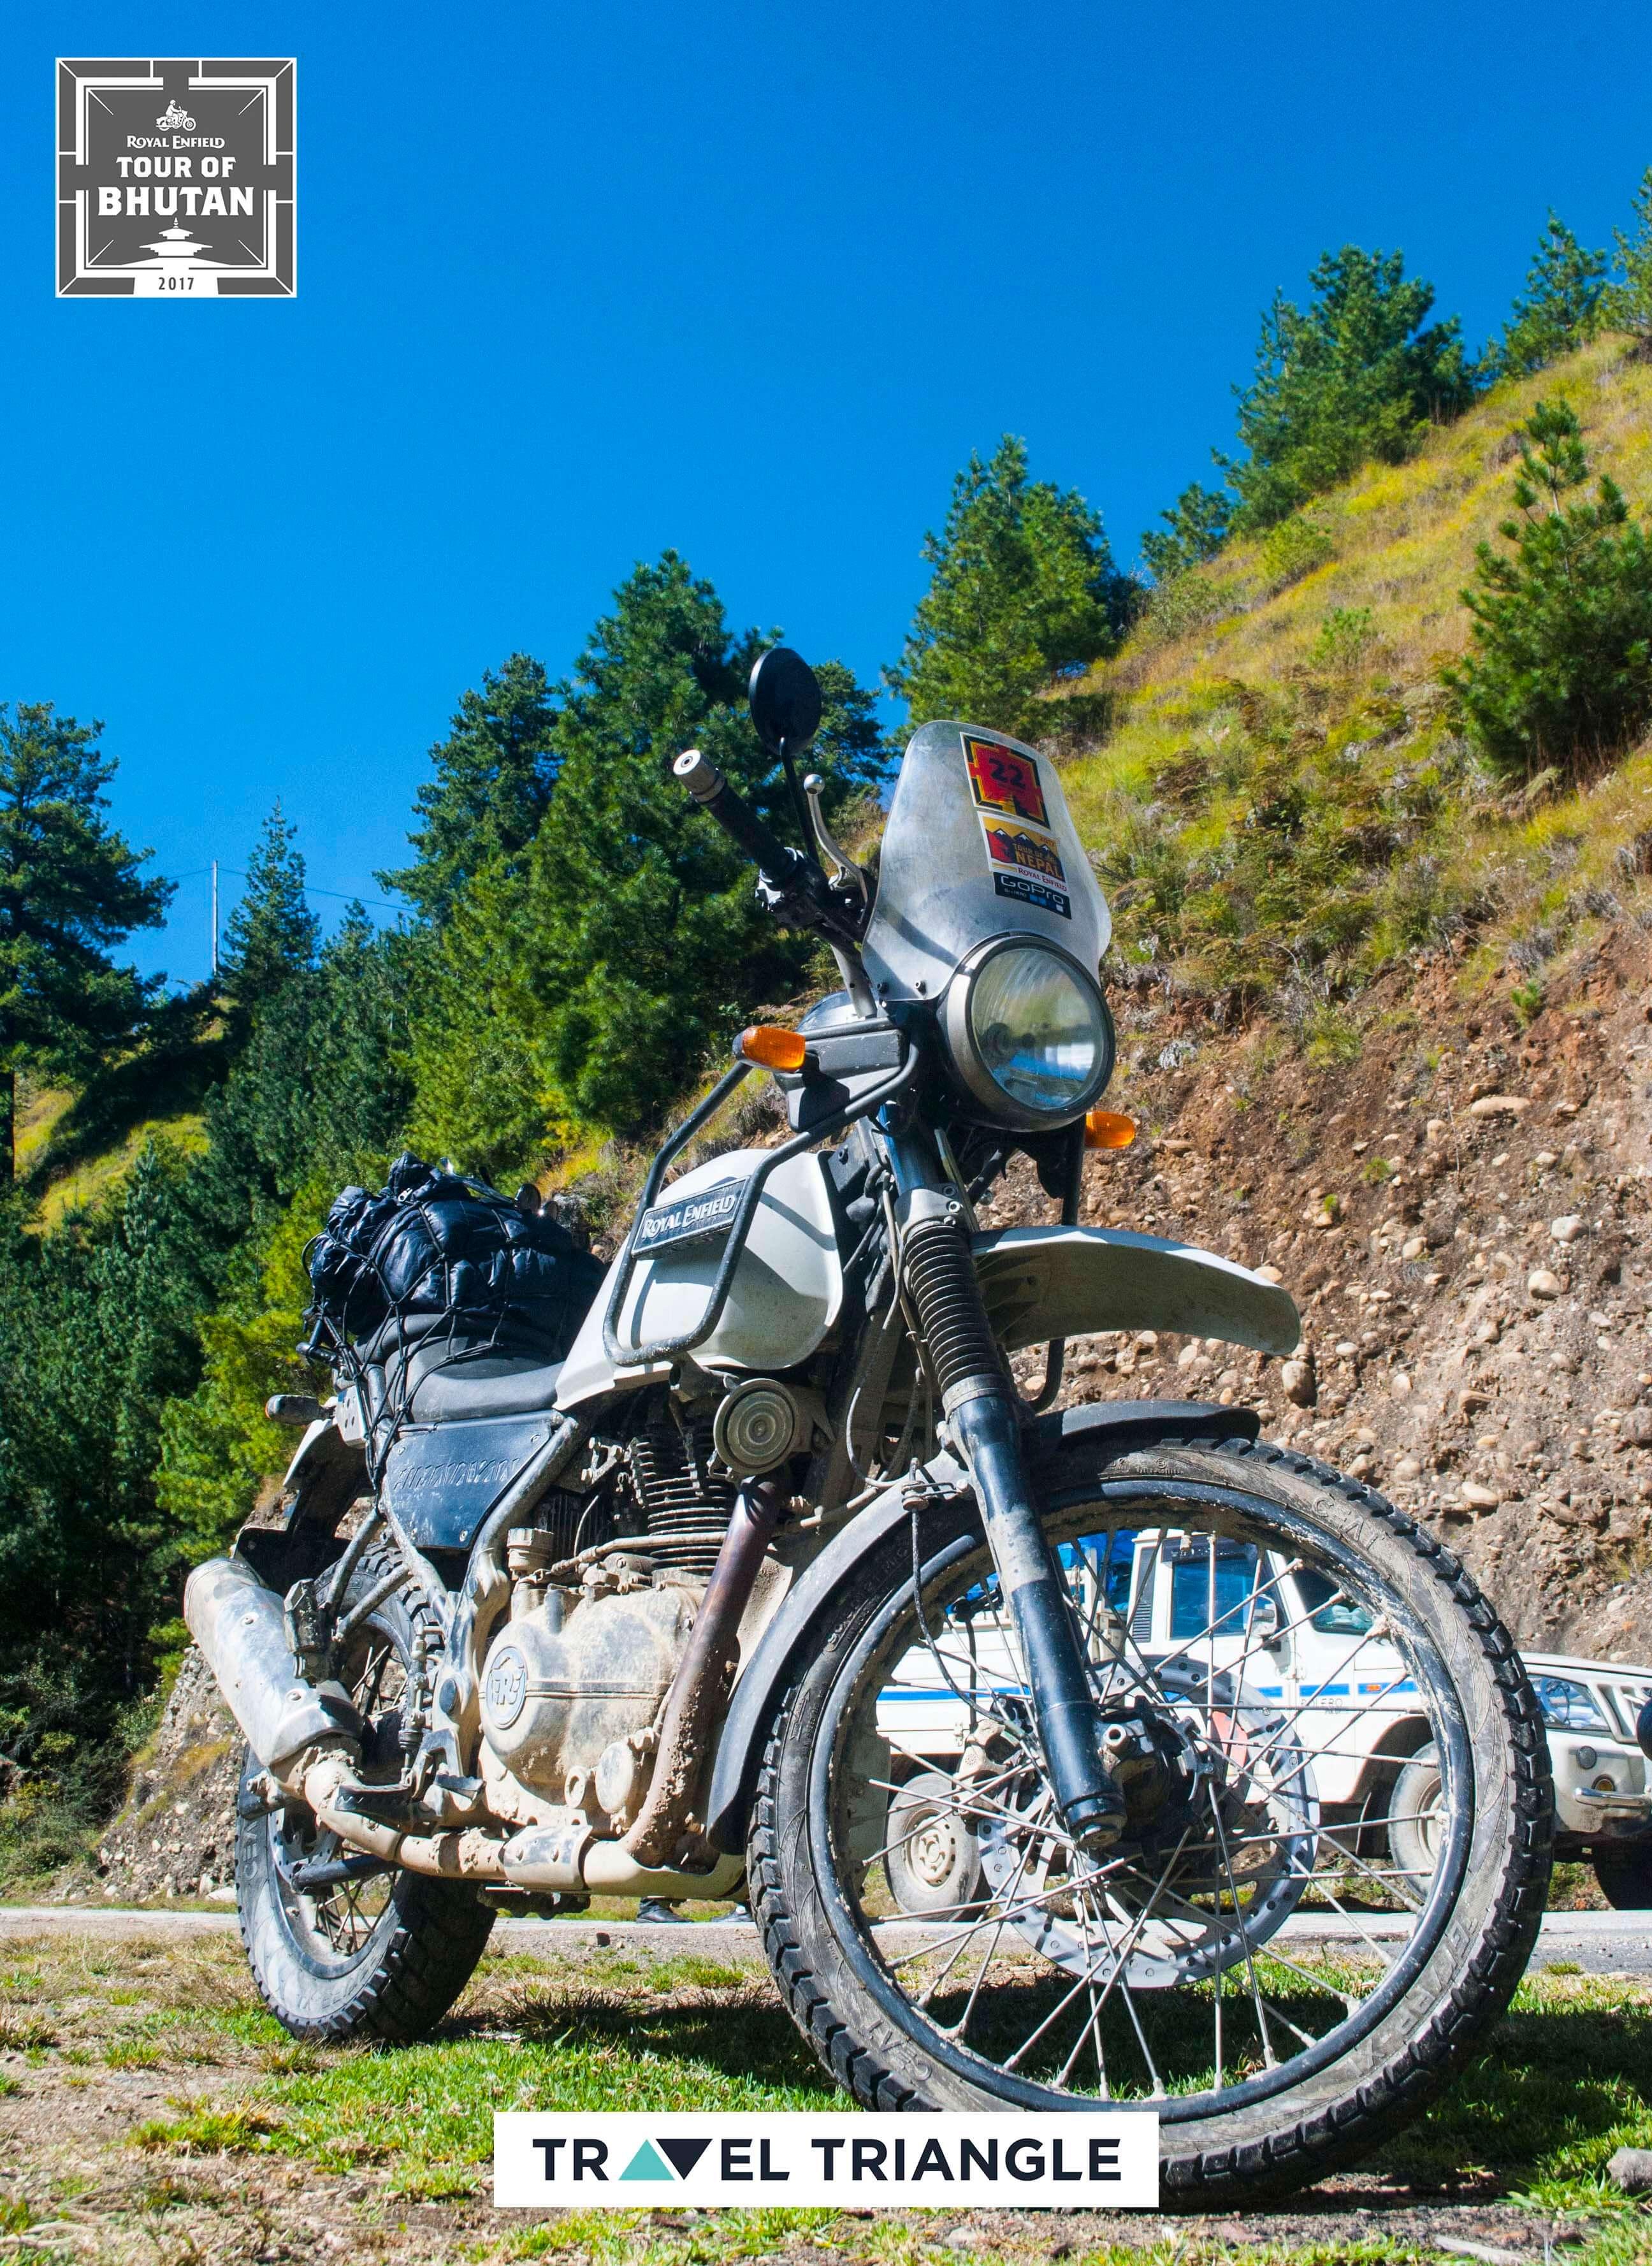 royal enfield india bhutan road trip: a royal enfield